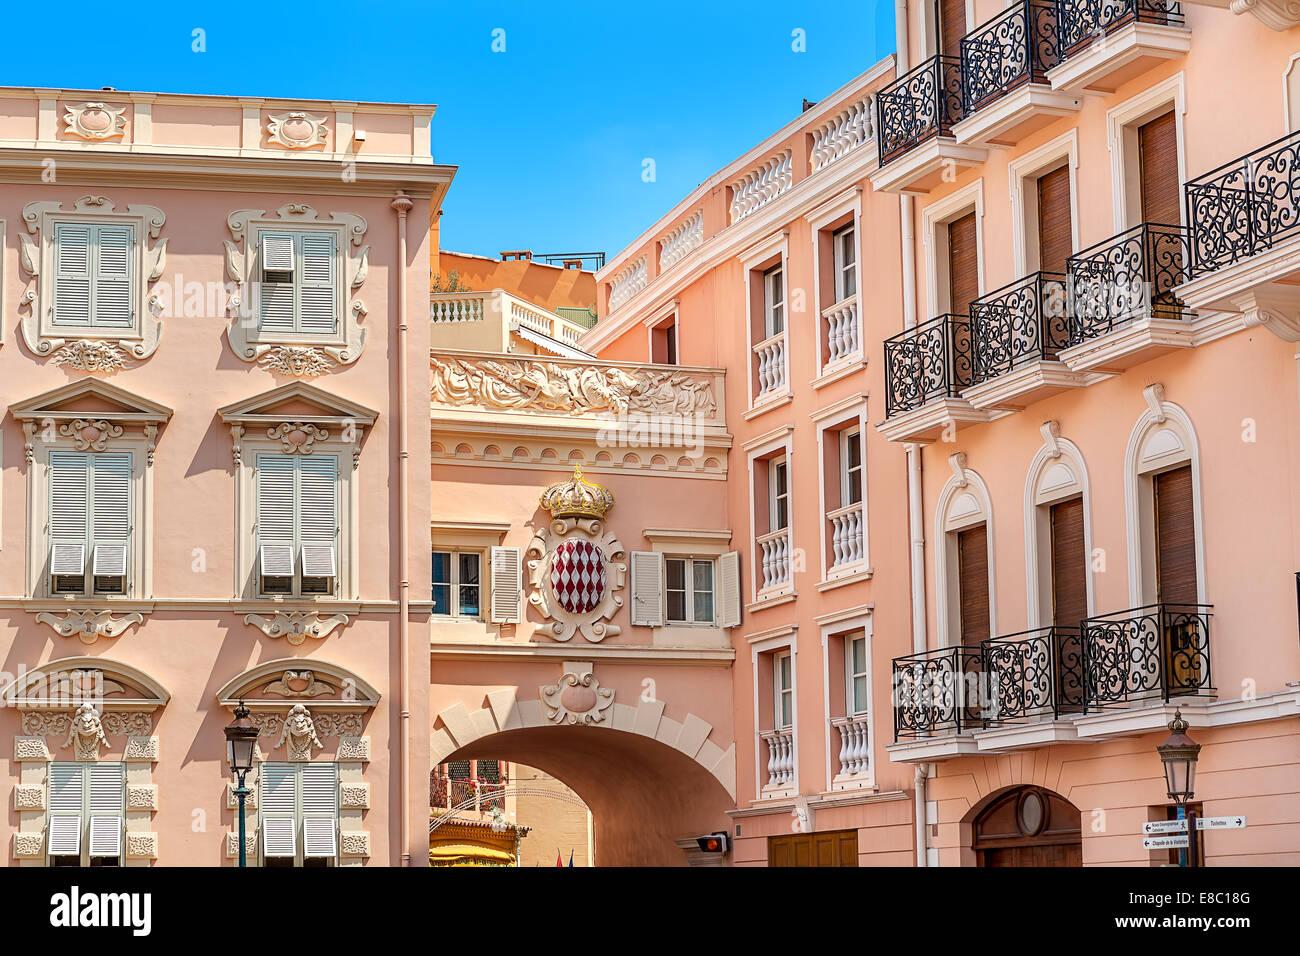 Typische Architektur in Monaco-Ville, Monaco. Stockbild